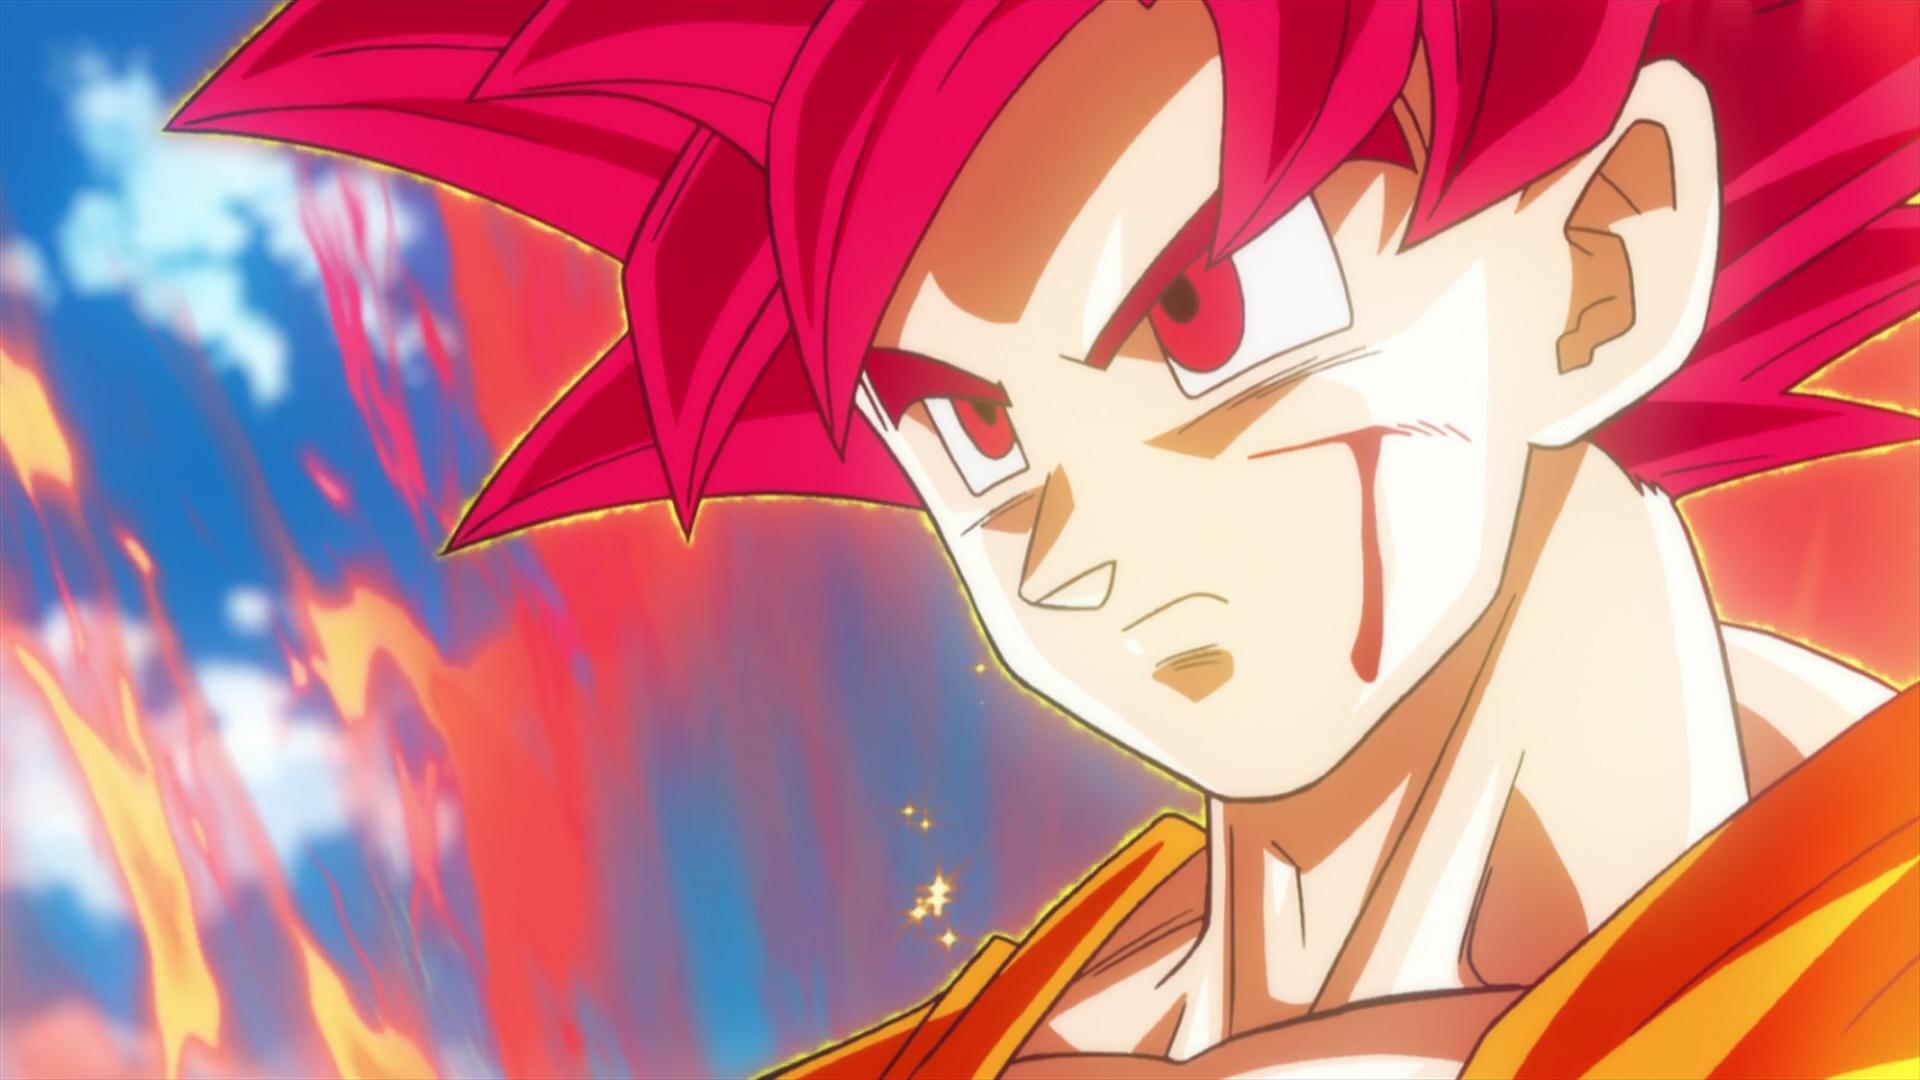 Goku God vs Mystic Gohan Gotenks SSJ3 Vegeta SSJ3 Fat Buu 1920x1080